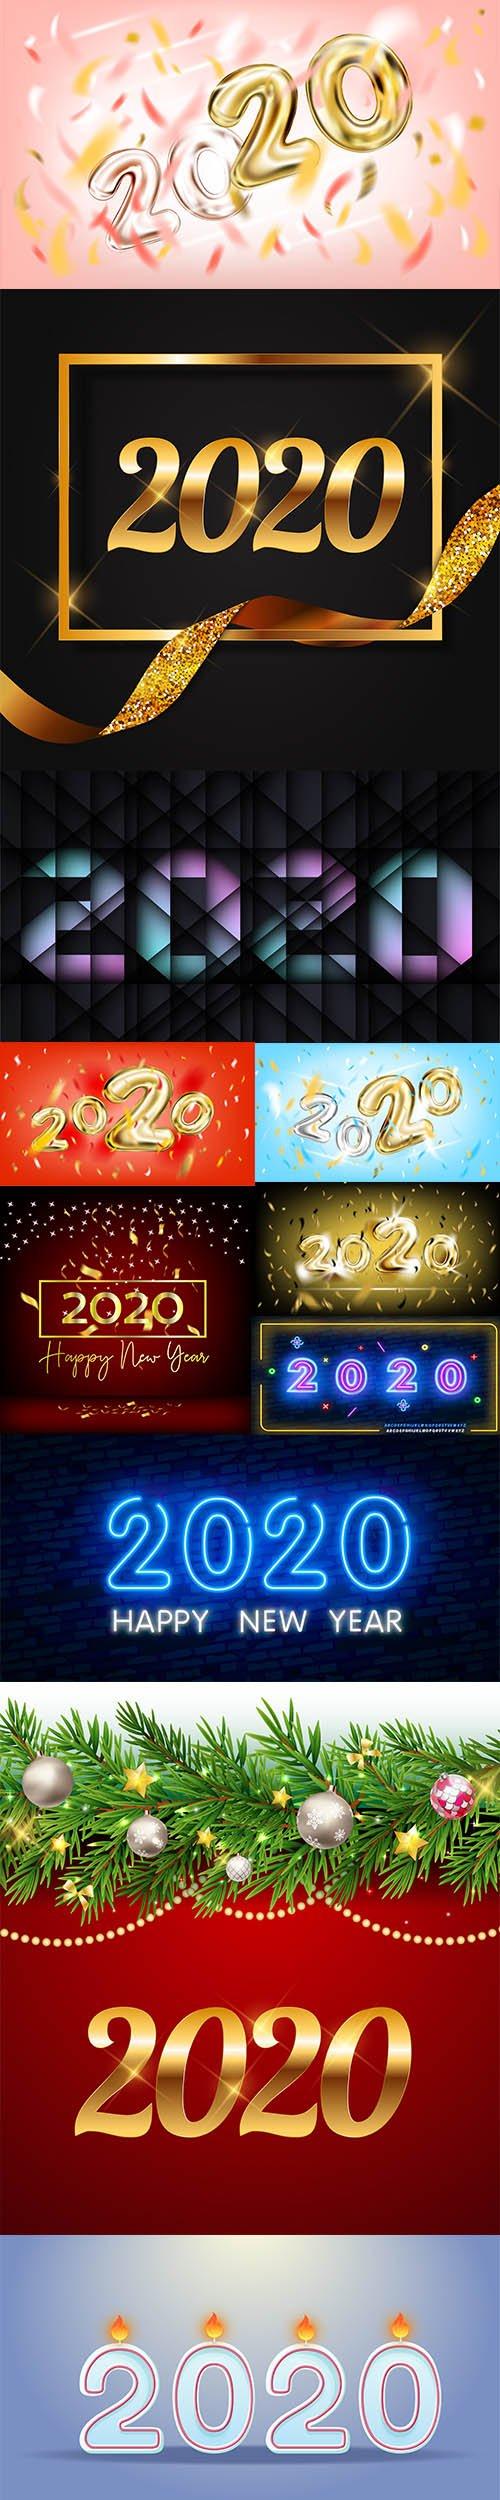 Happy New Year 2020 Illustrations